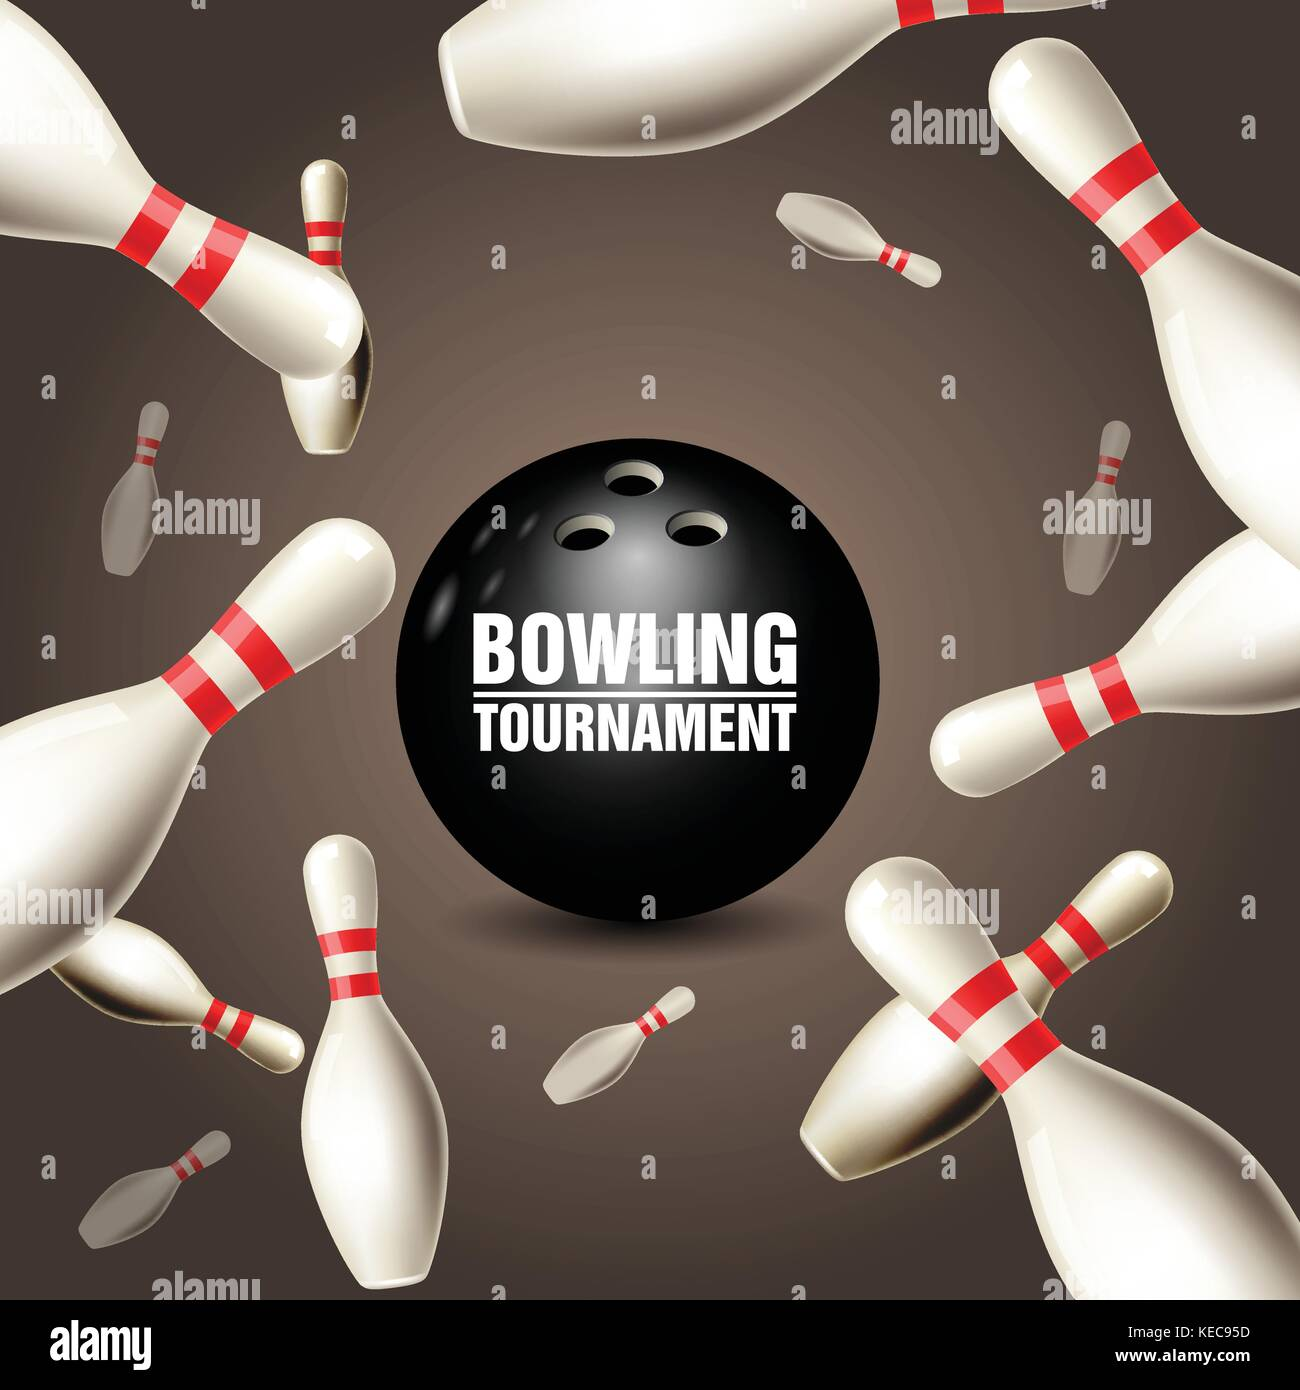 Bowling Shoe Stockfotos & Bowling Shoe Bilder - Seite 3 - Alamy